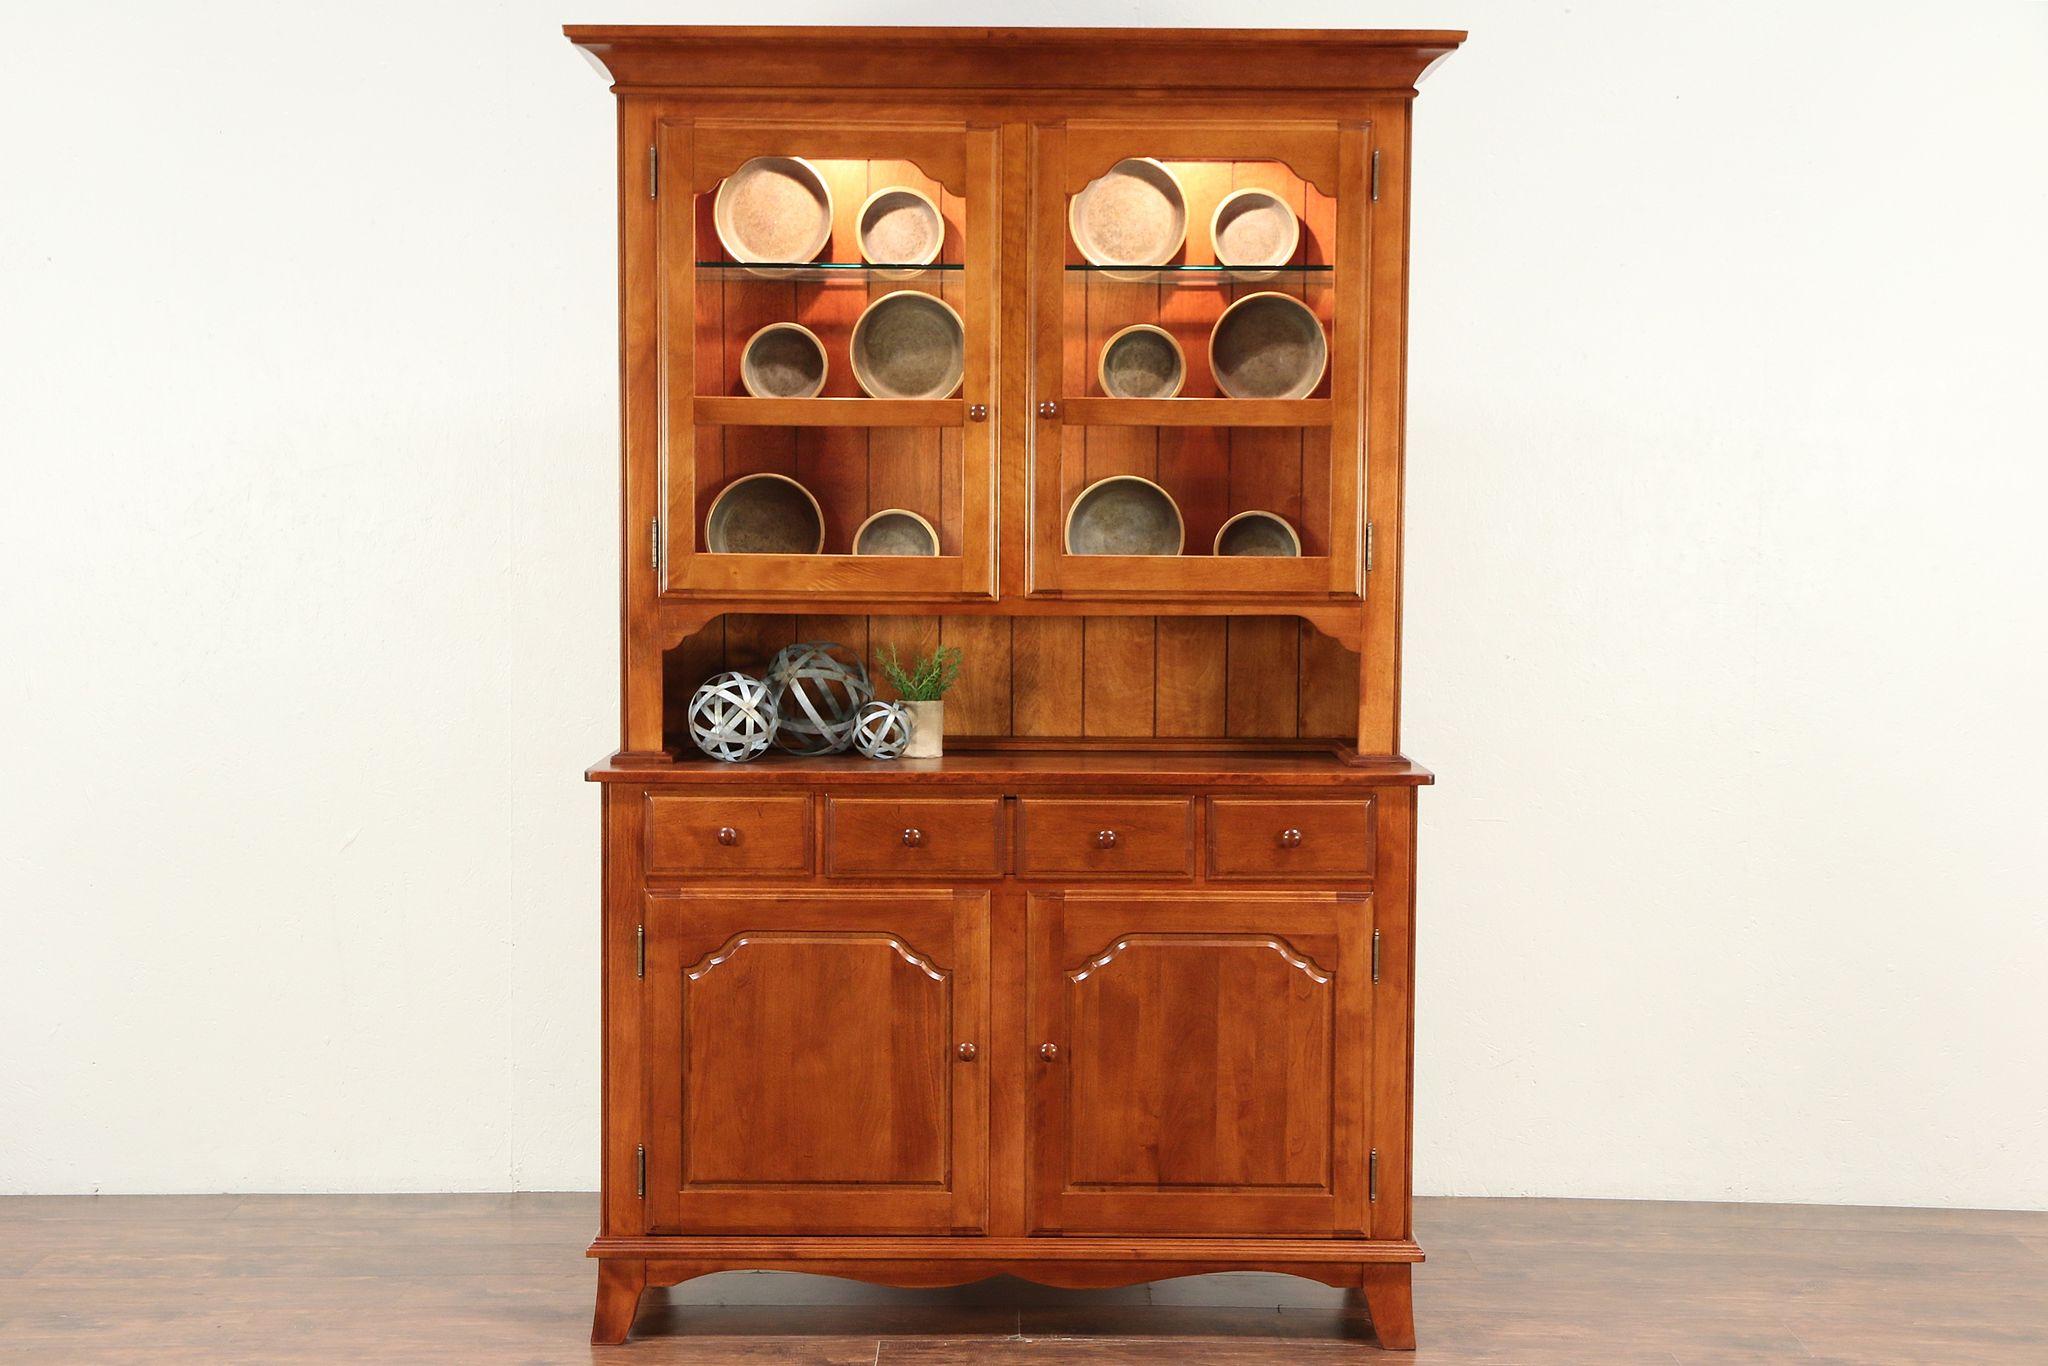 Exceptionnel Nichols U0026 Stone Vintage Hutch Cabinet Provence Buffet U0026 China Deck #29687  ...